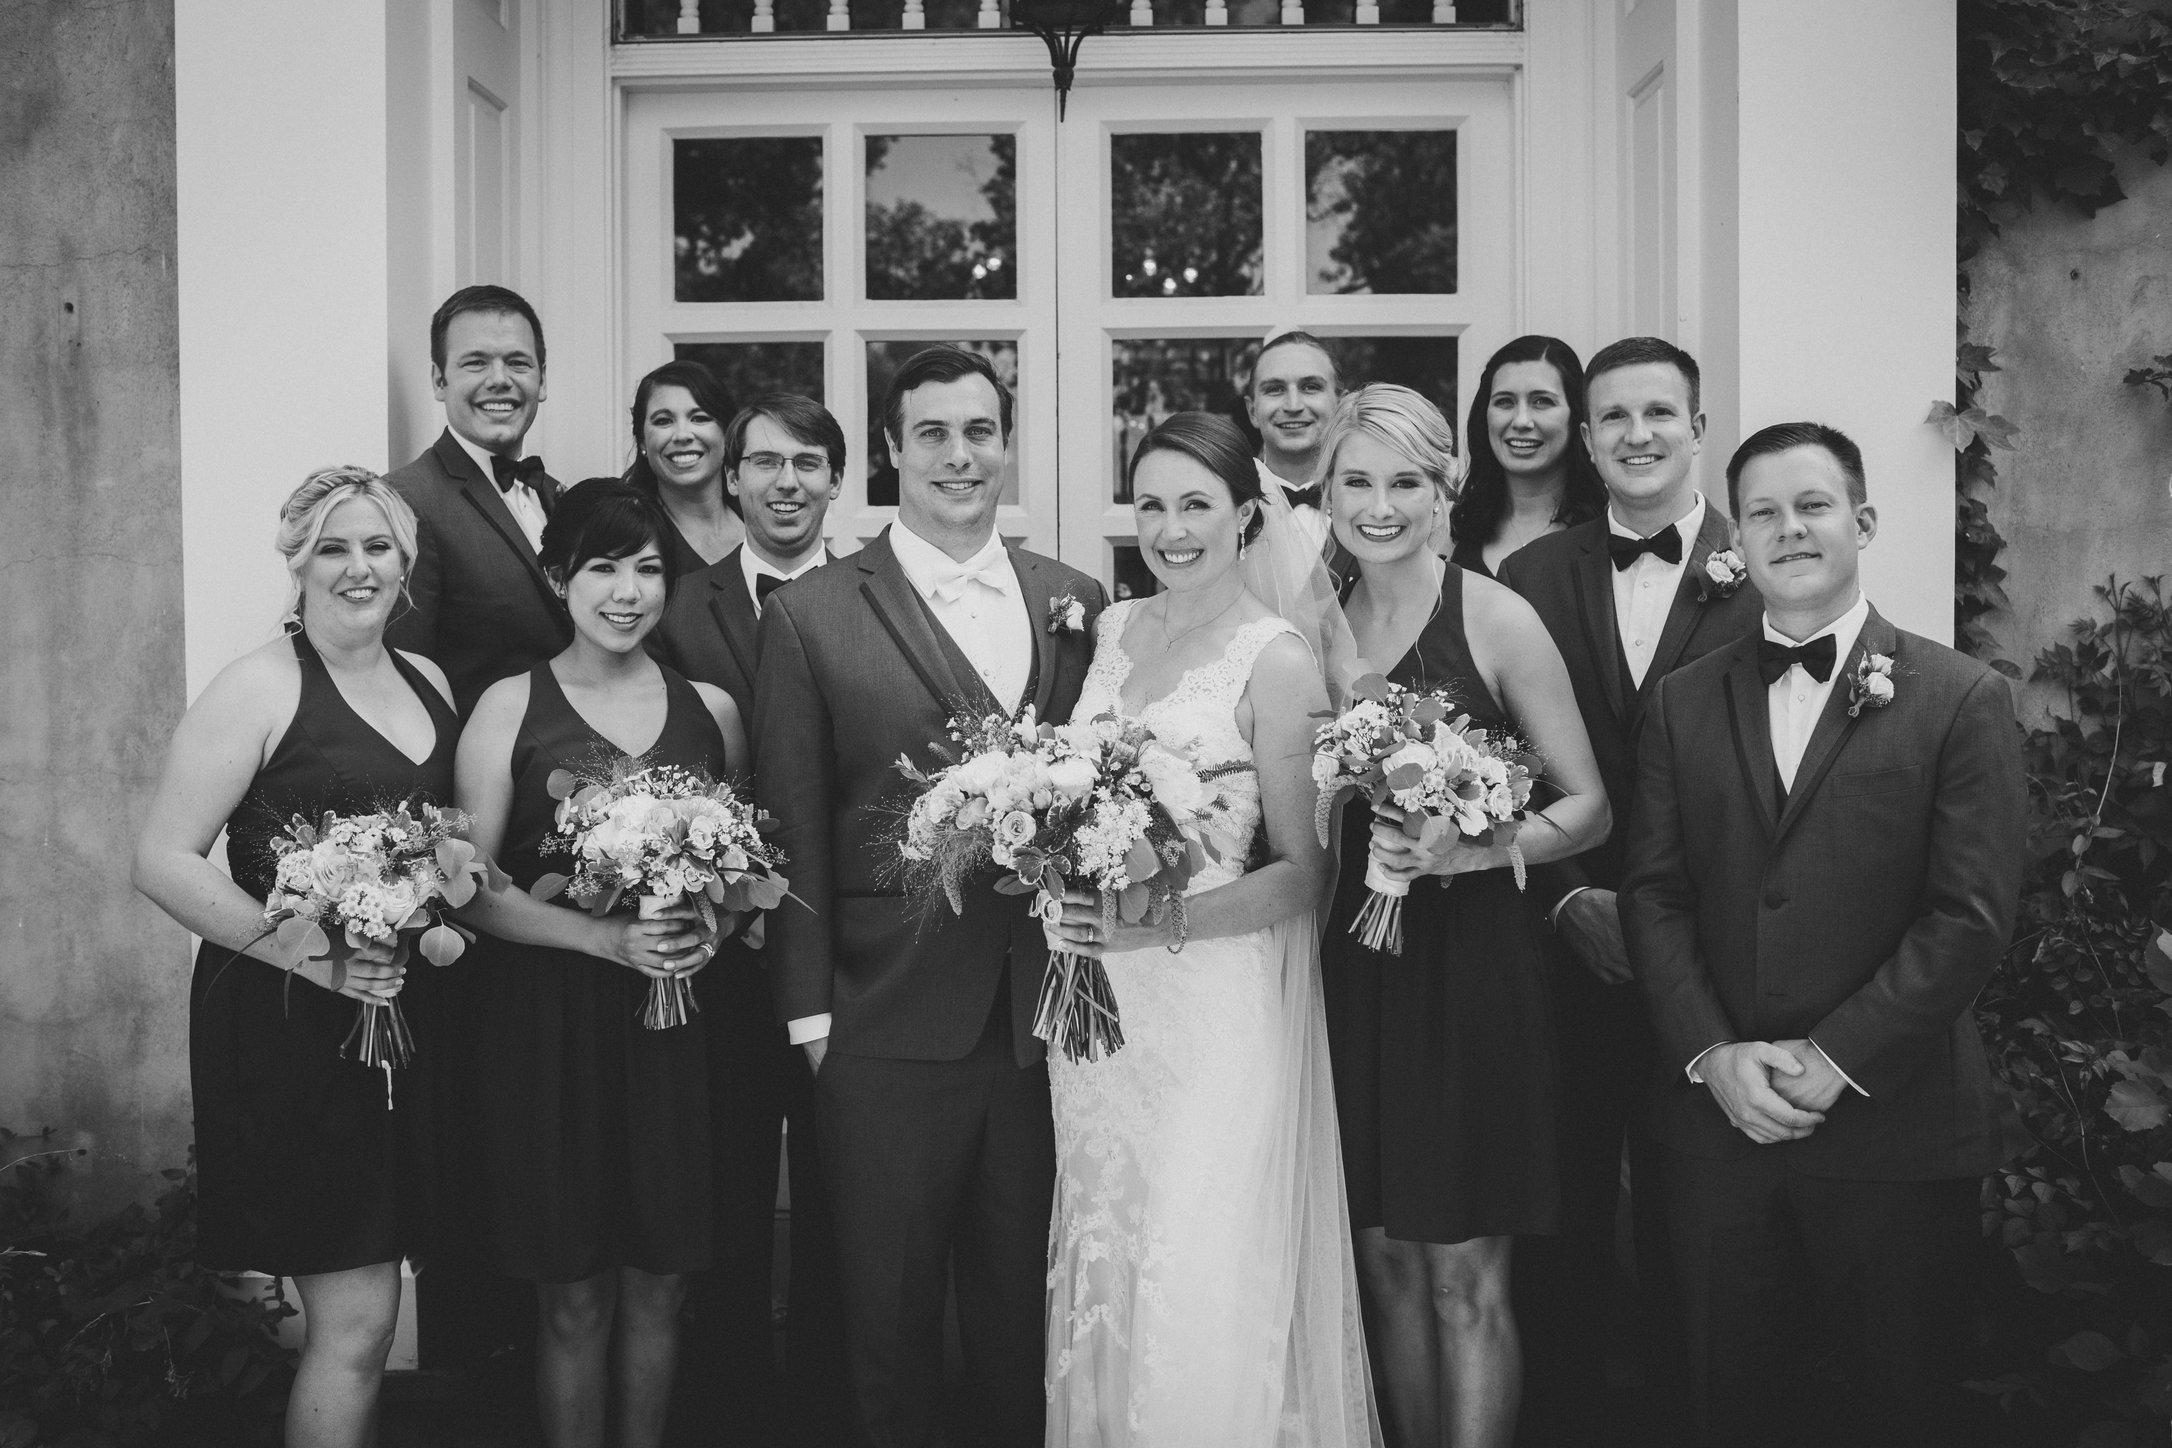 SandC-wedding-343.jpg